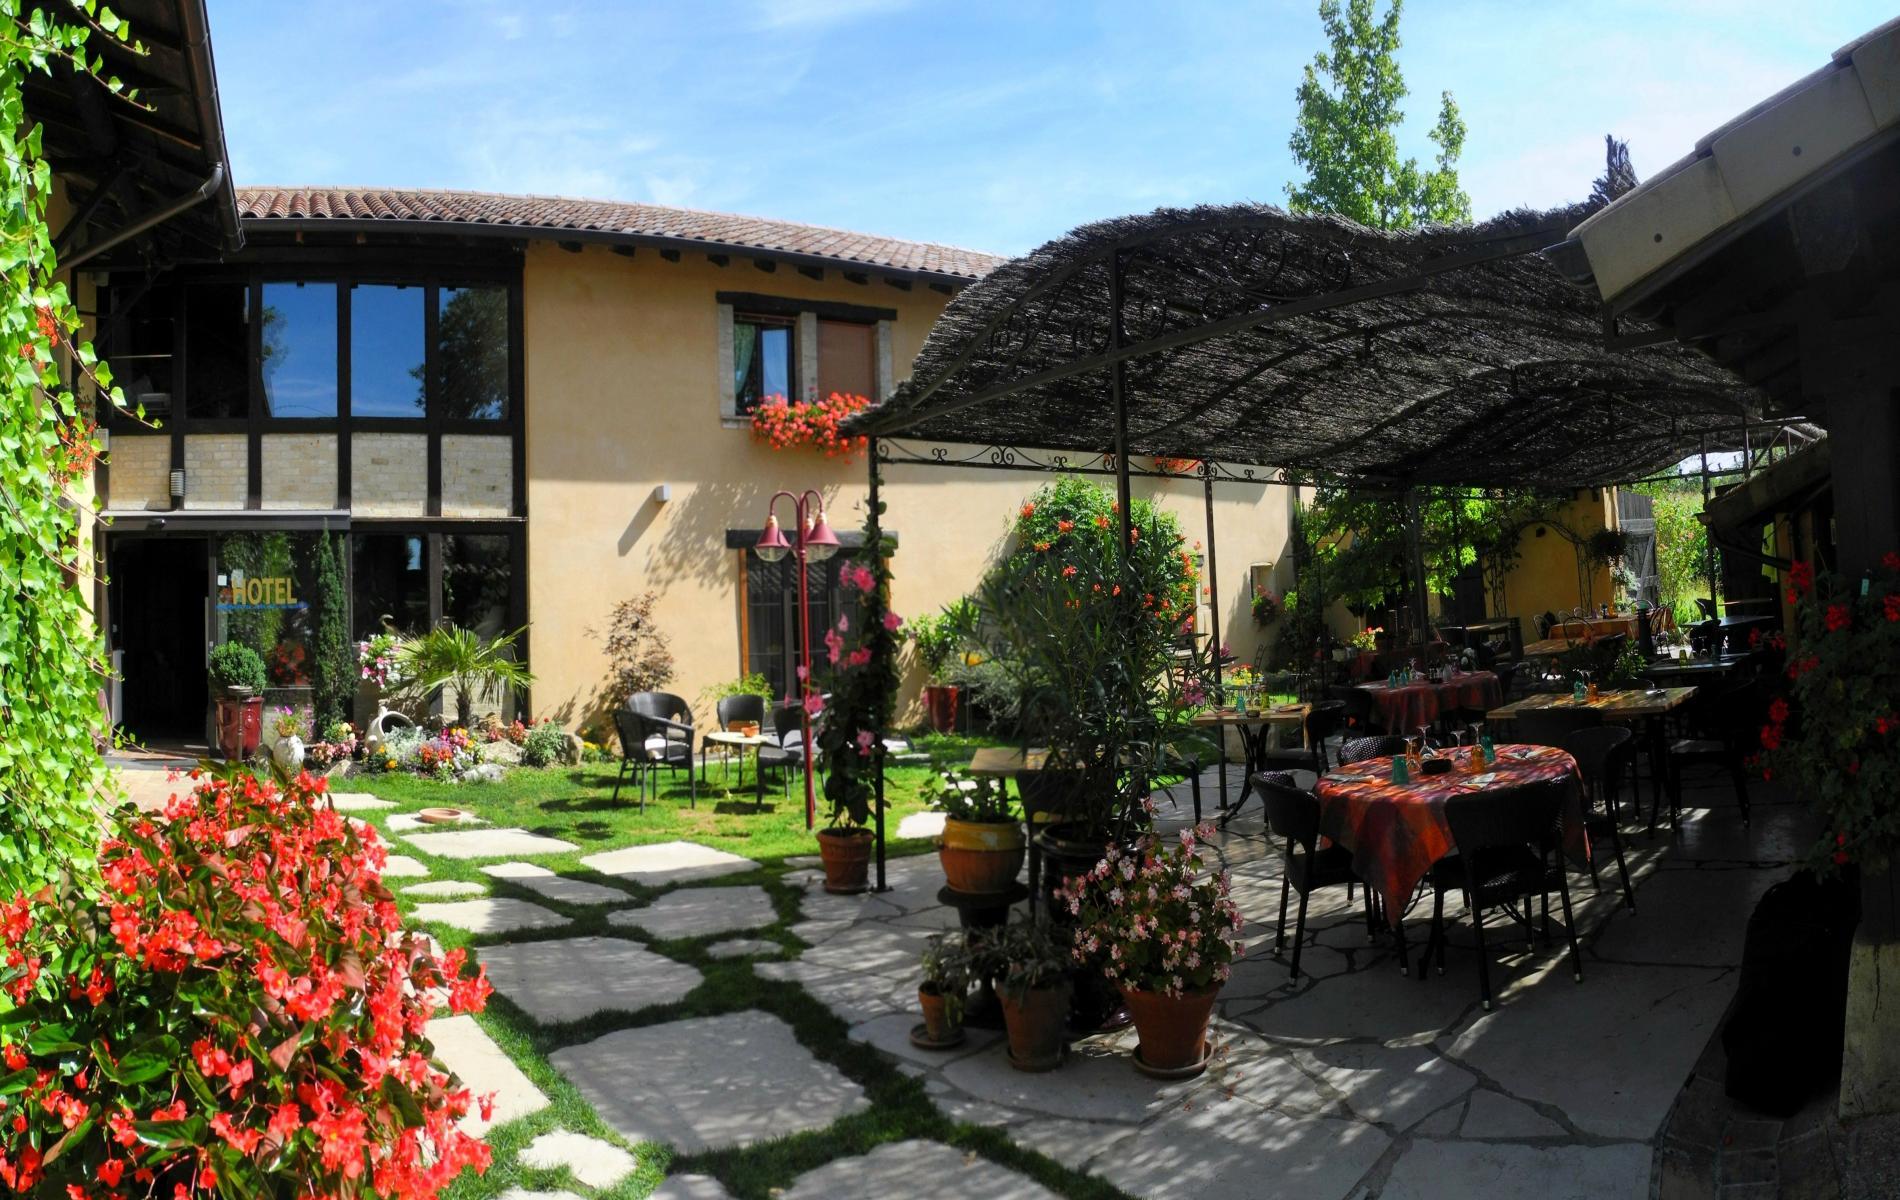 Restaurant avec jardin proche villefranche sur saone for Resto avec jardin